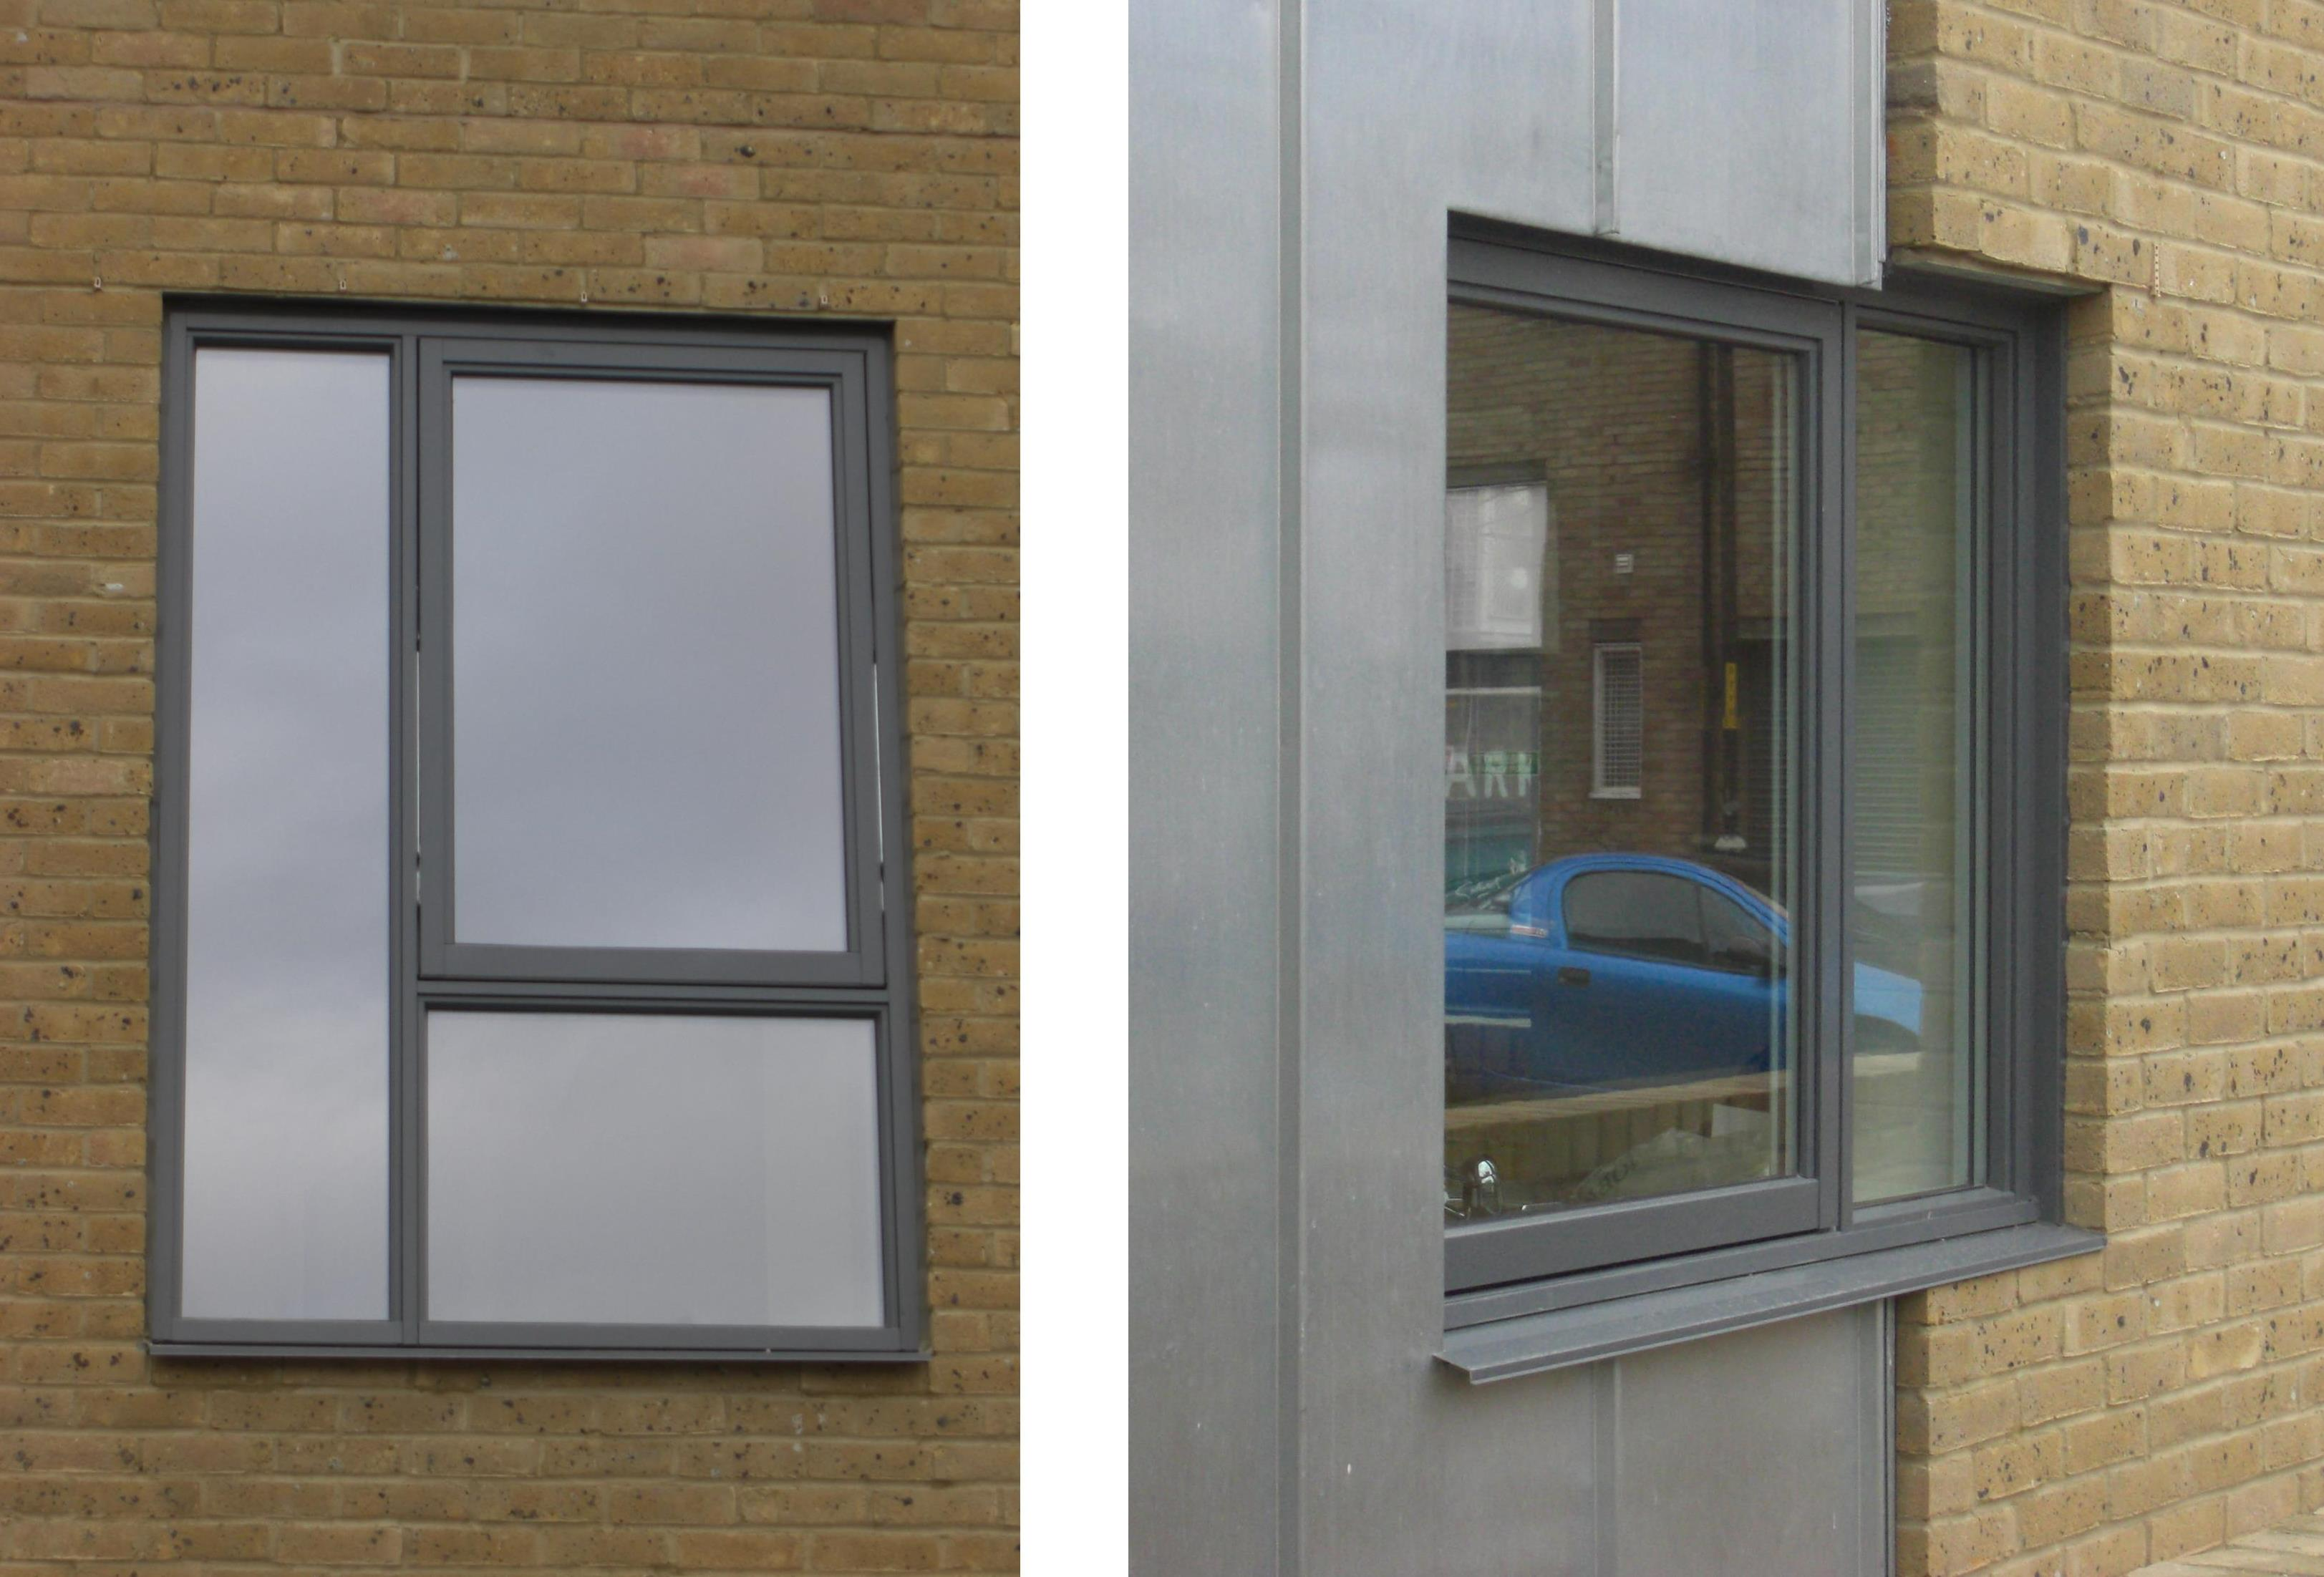 Top Hung Alu-Clad Windows